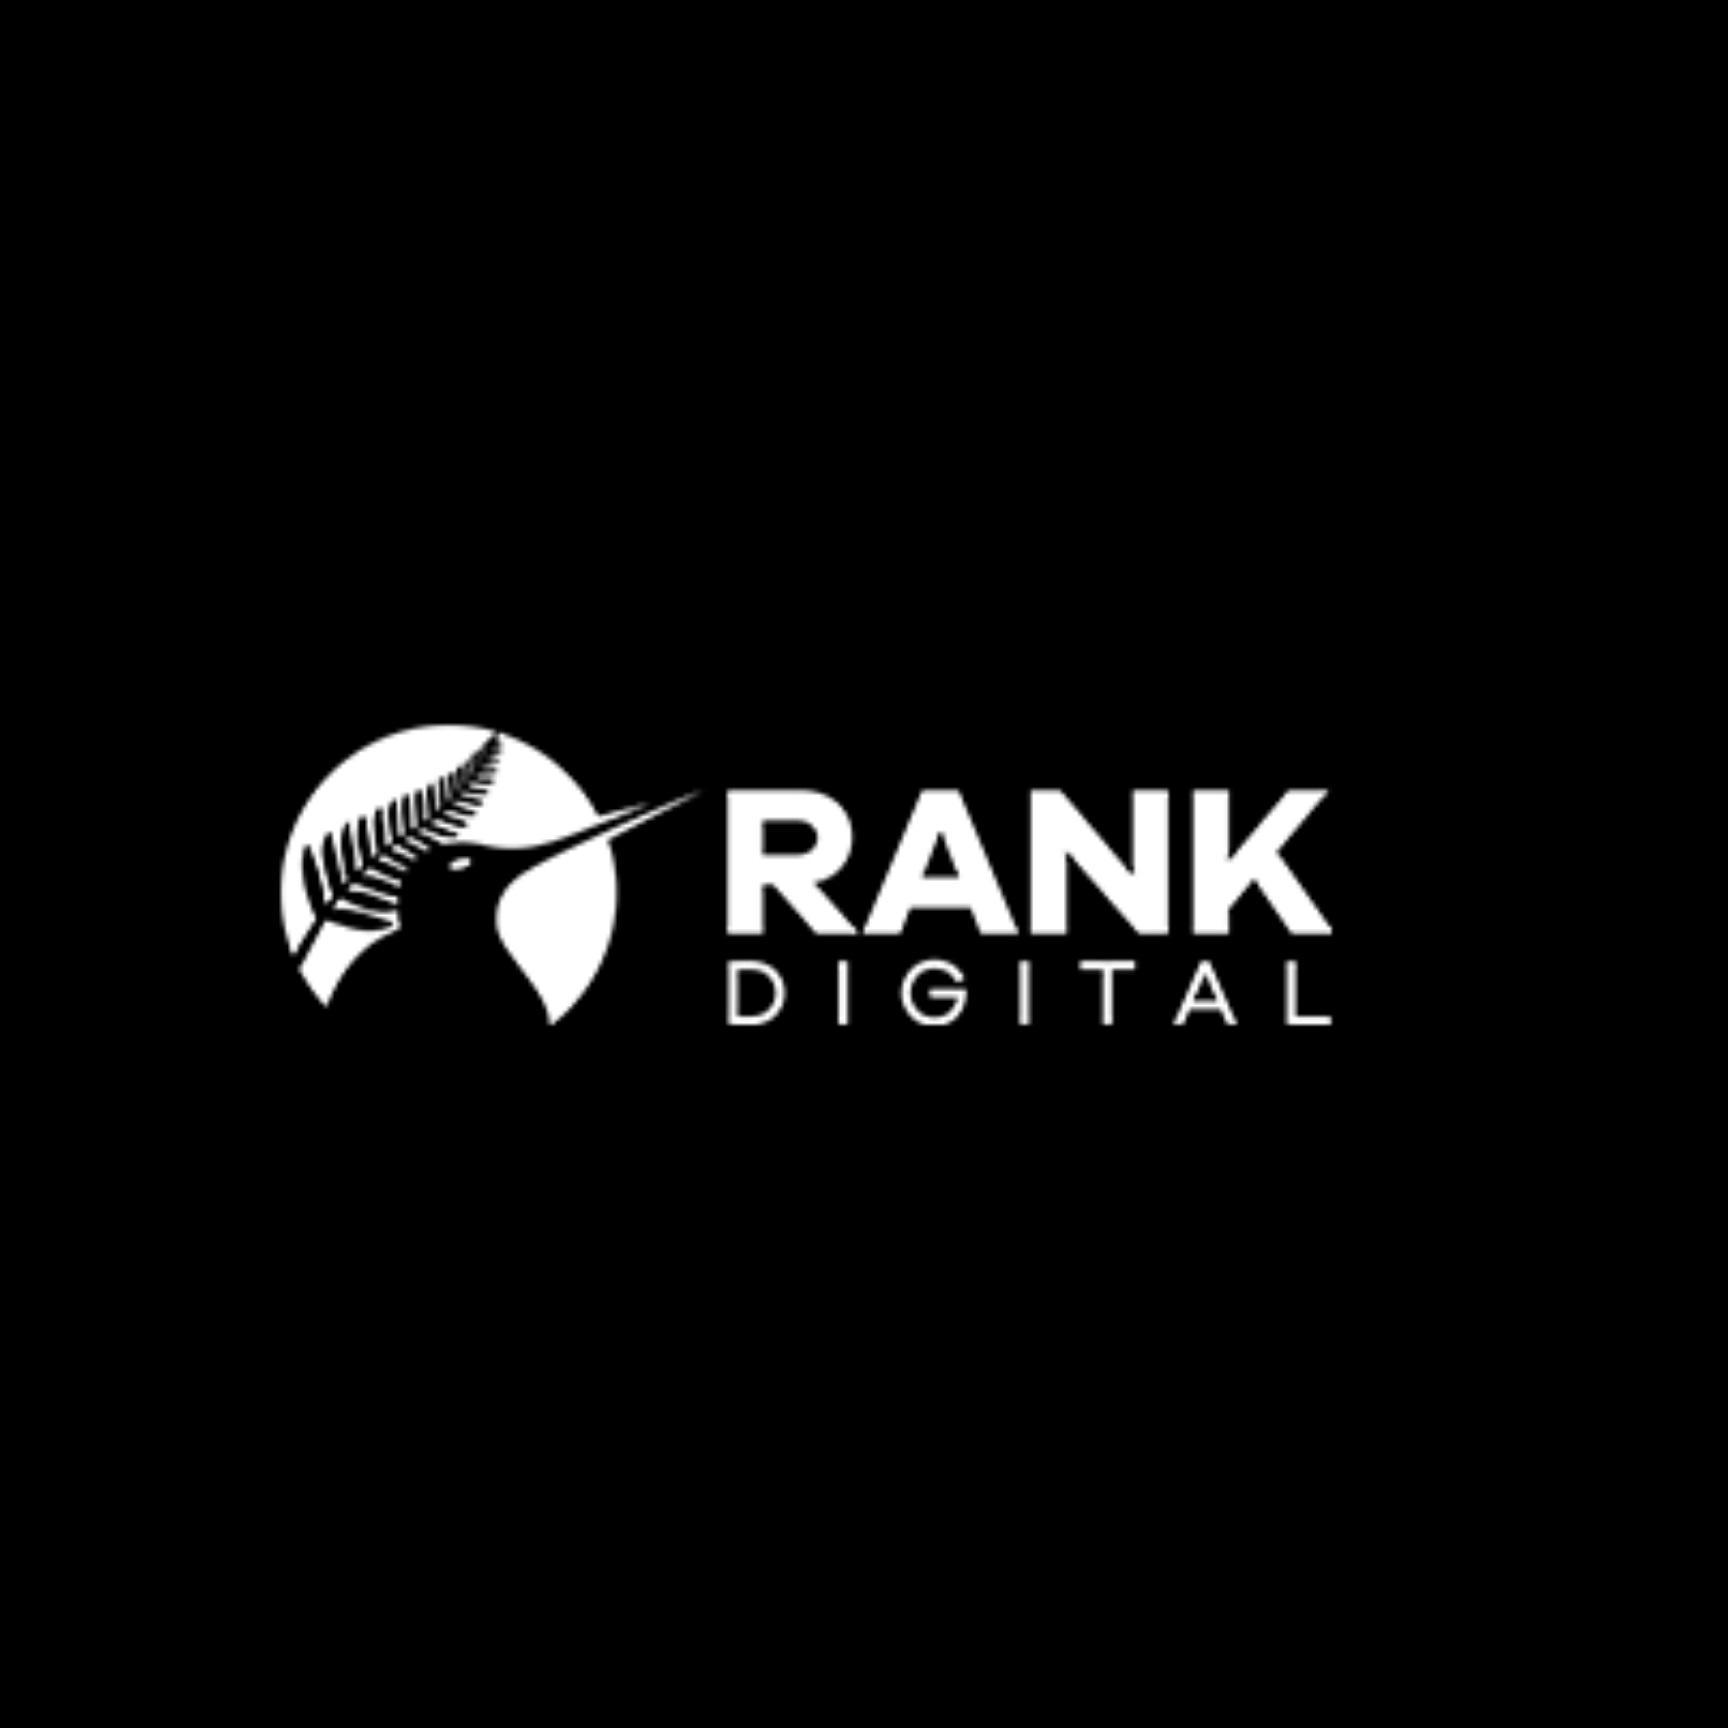 Rank Digital